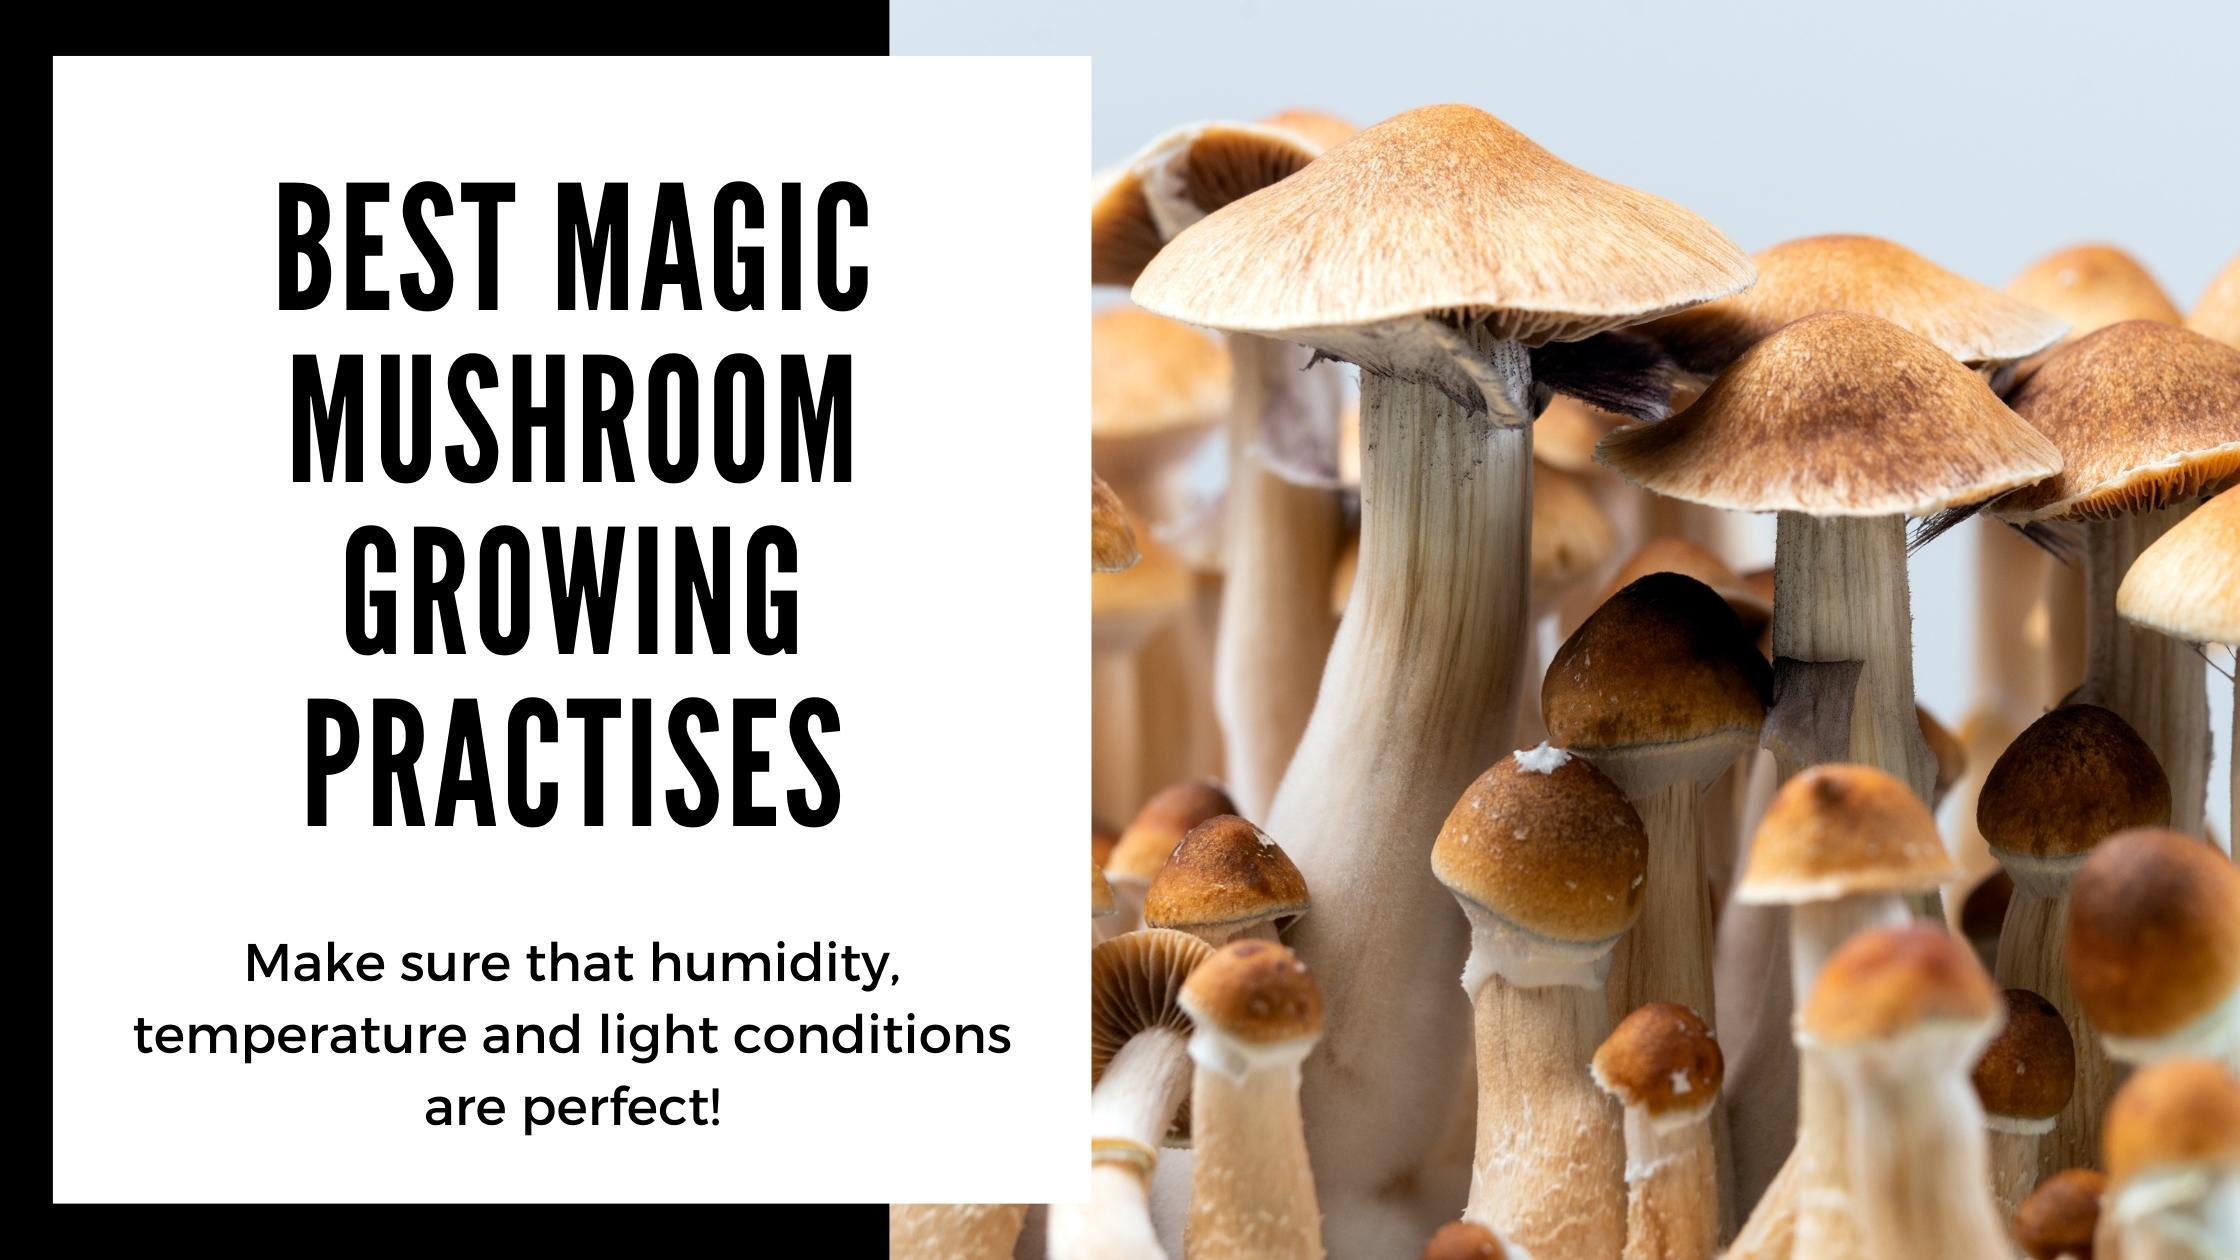 Best Magic Mushroom Grow Kit tips